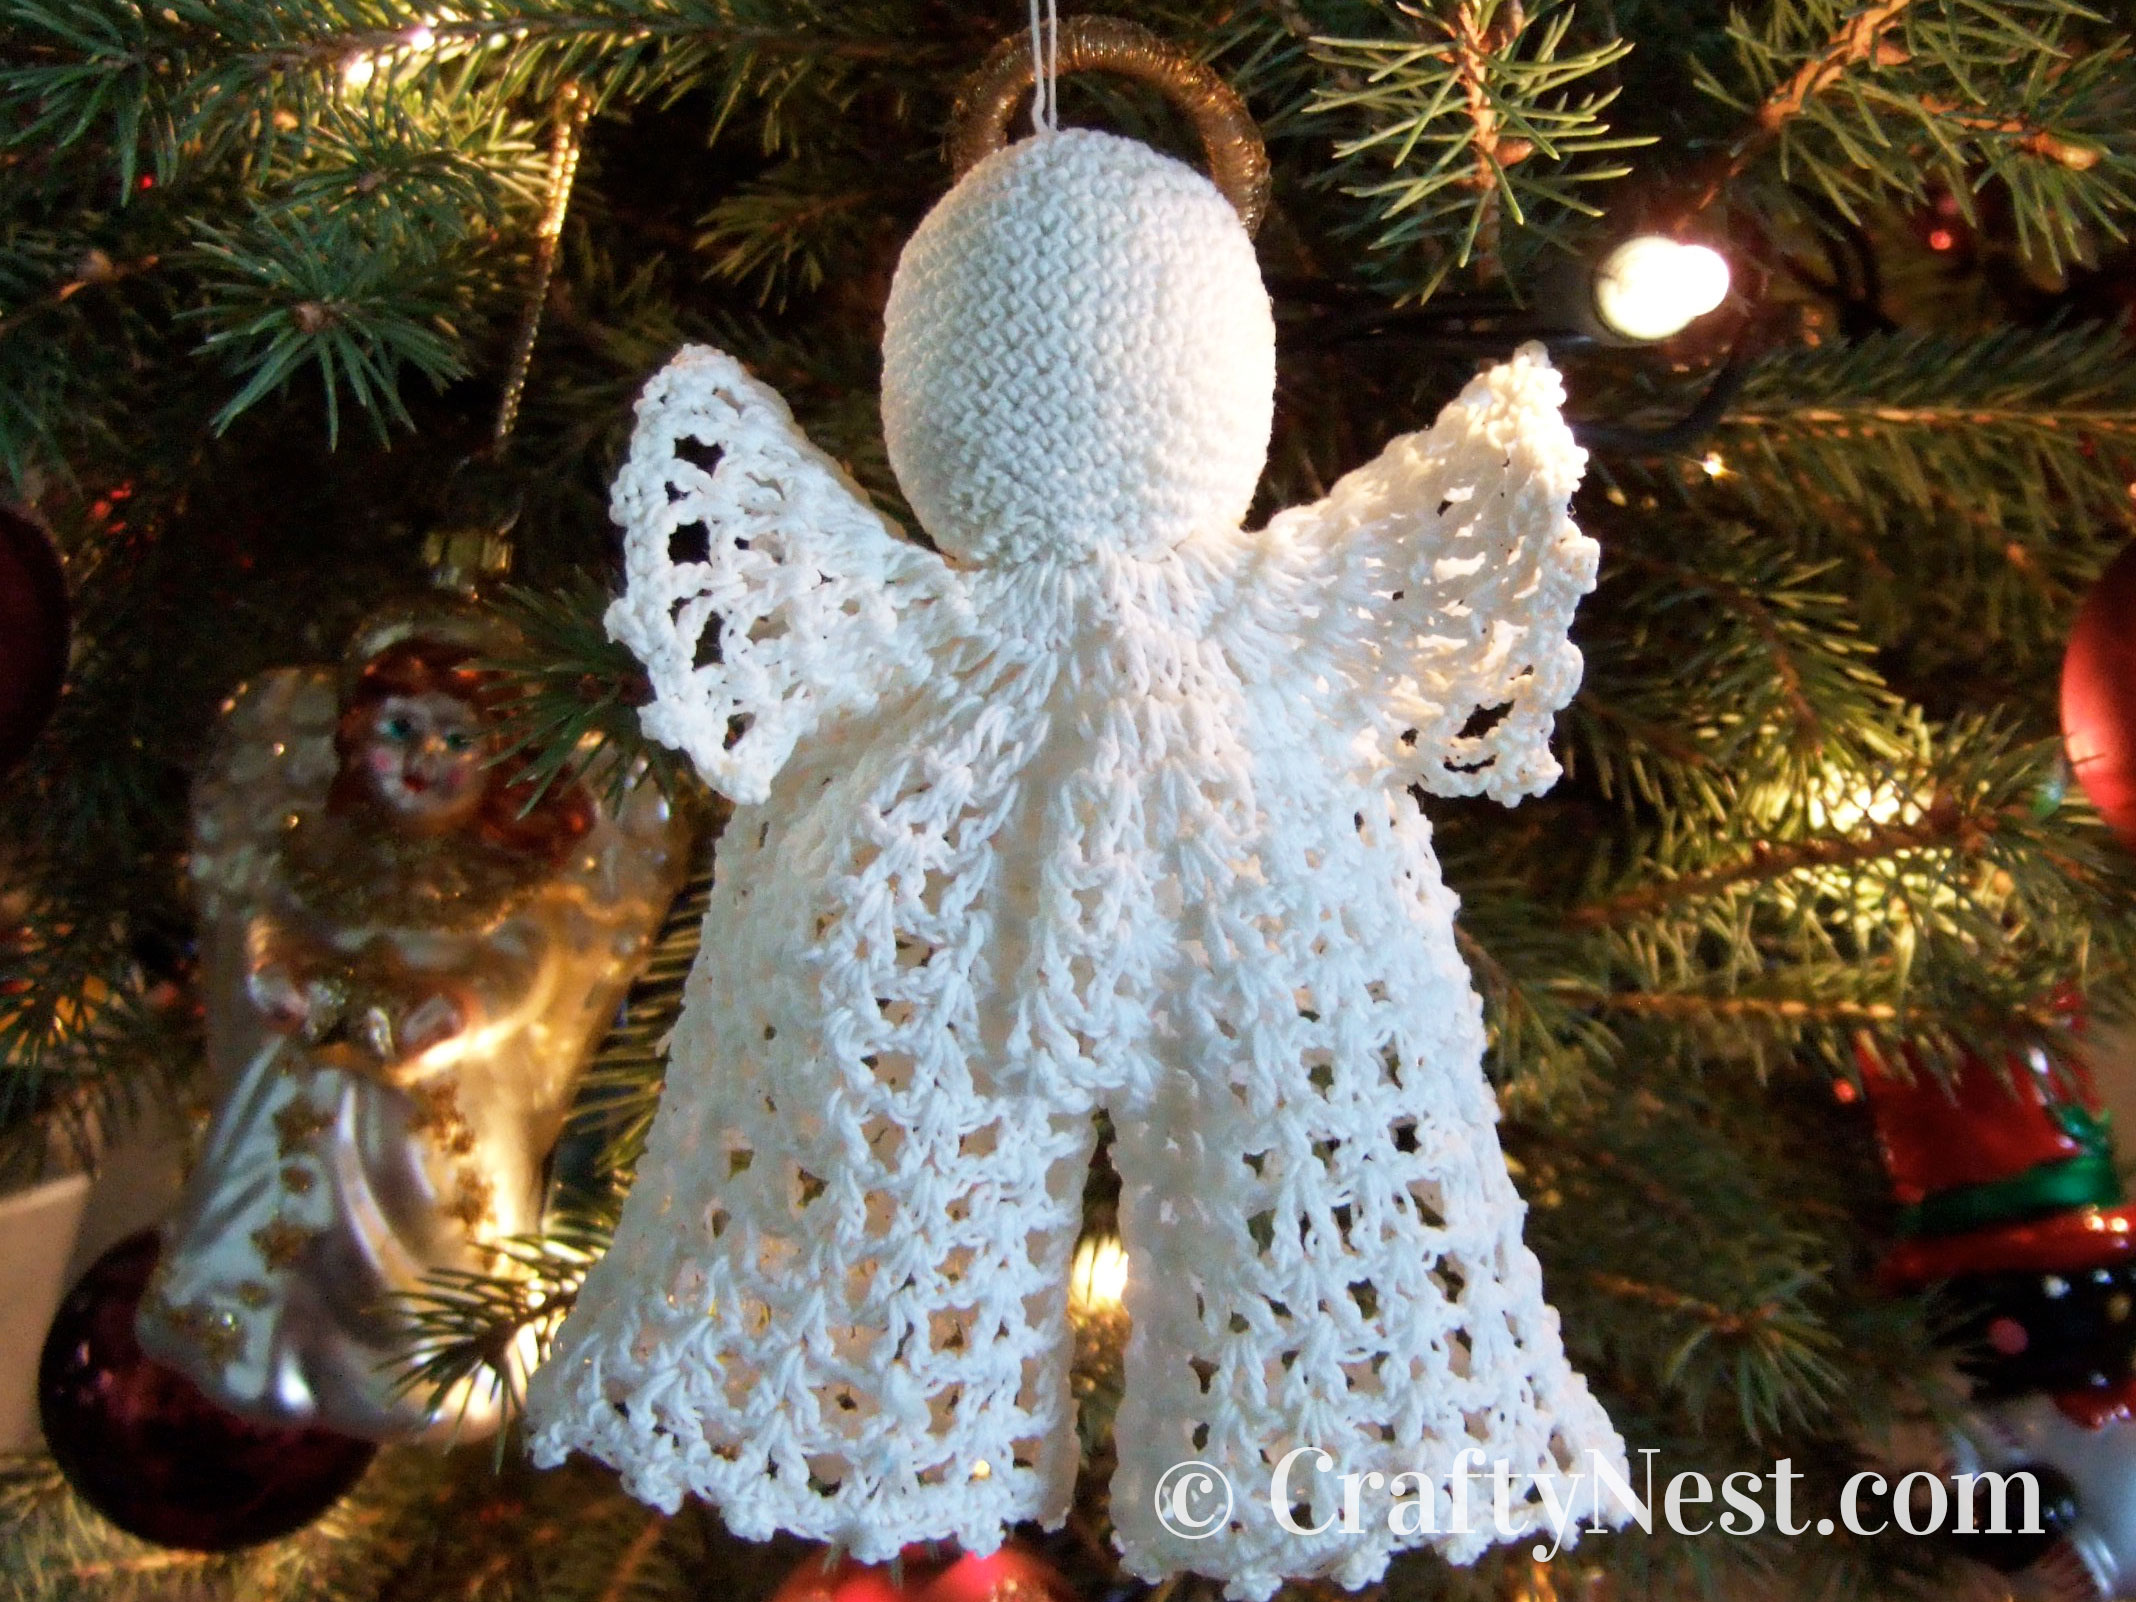 Angel Christmas tree ornament with pants, photo